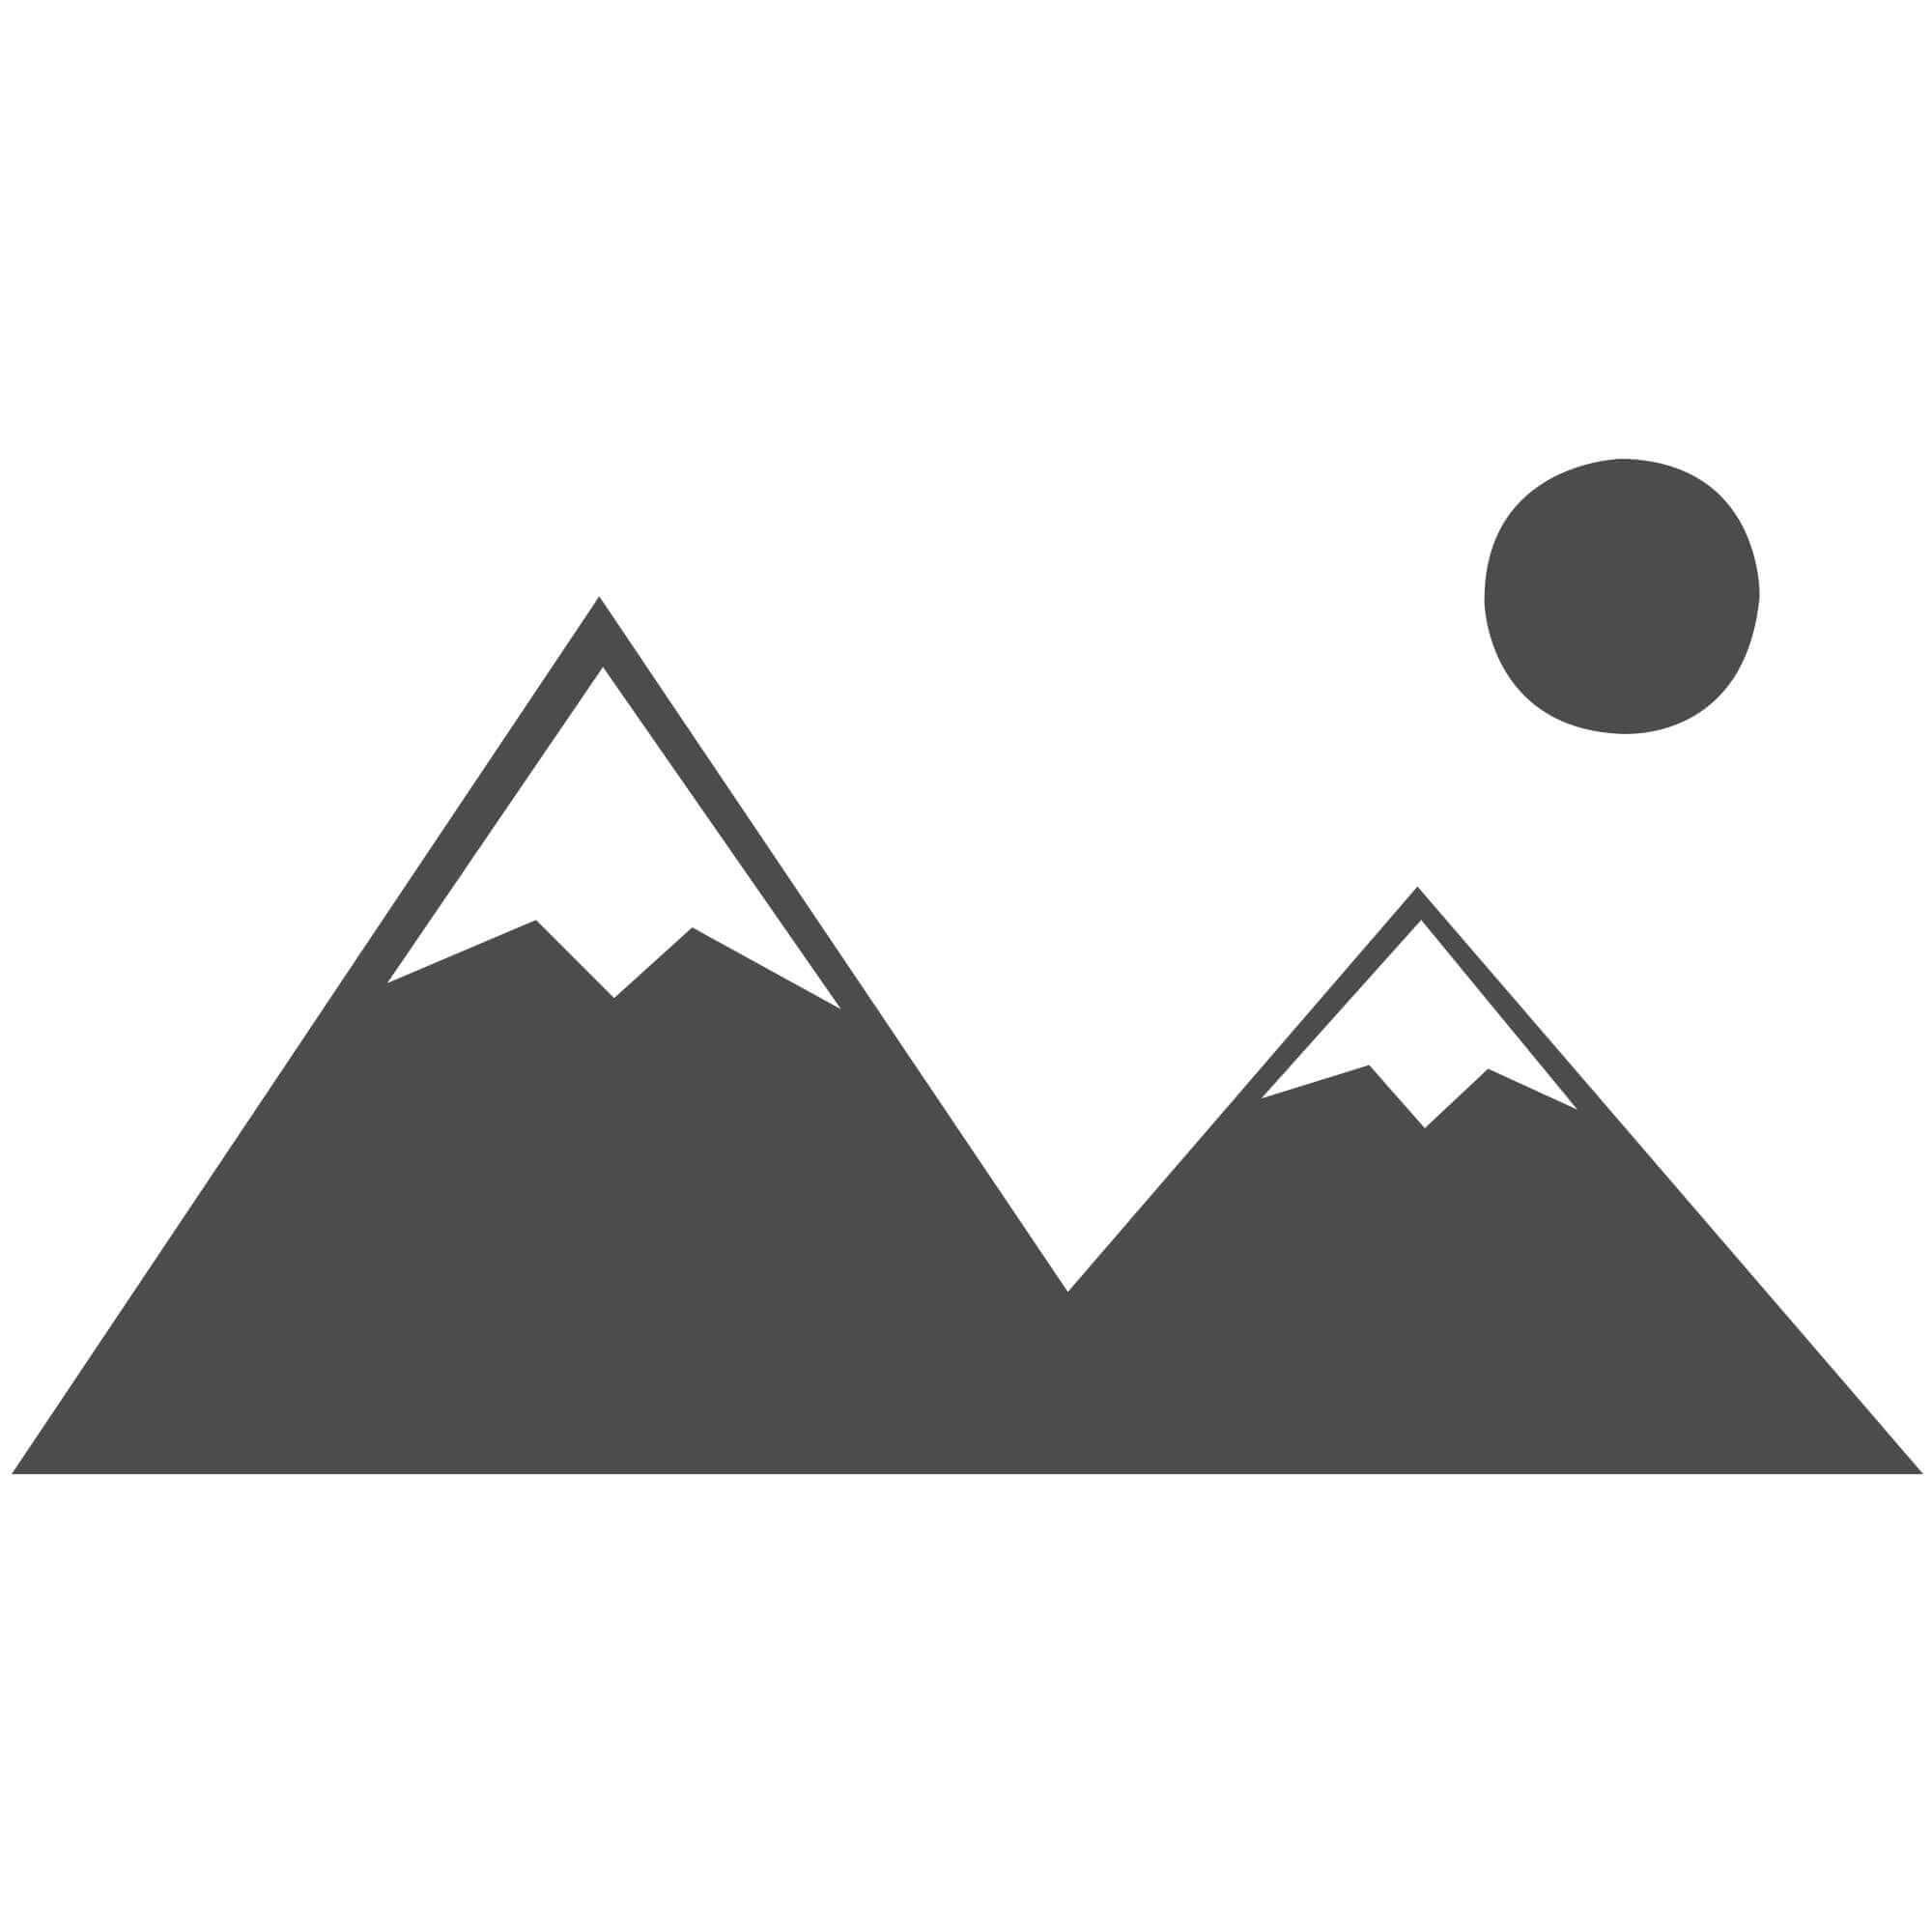 "Cascade Shaggy Rug - Forest Green - Size 65 x 135 cm (2'2"" x 4'5"")"